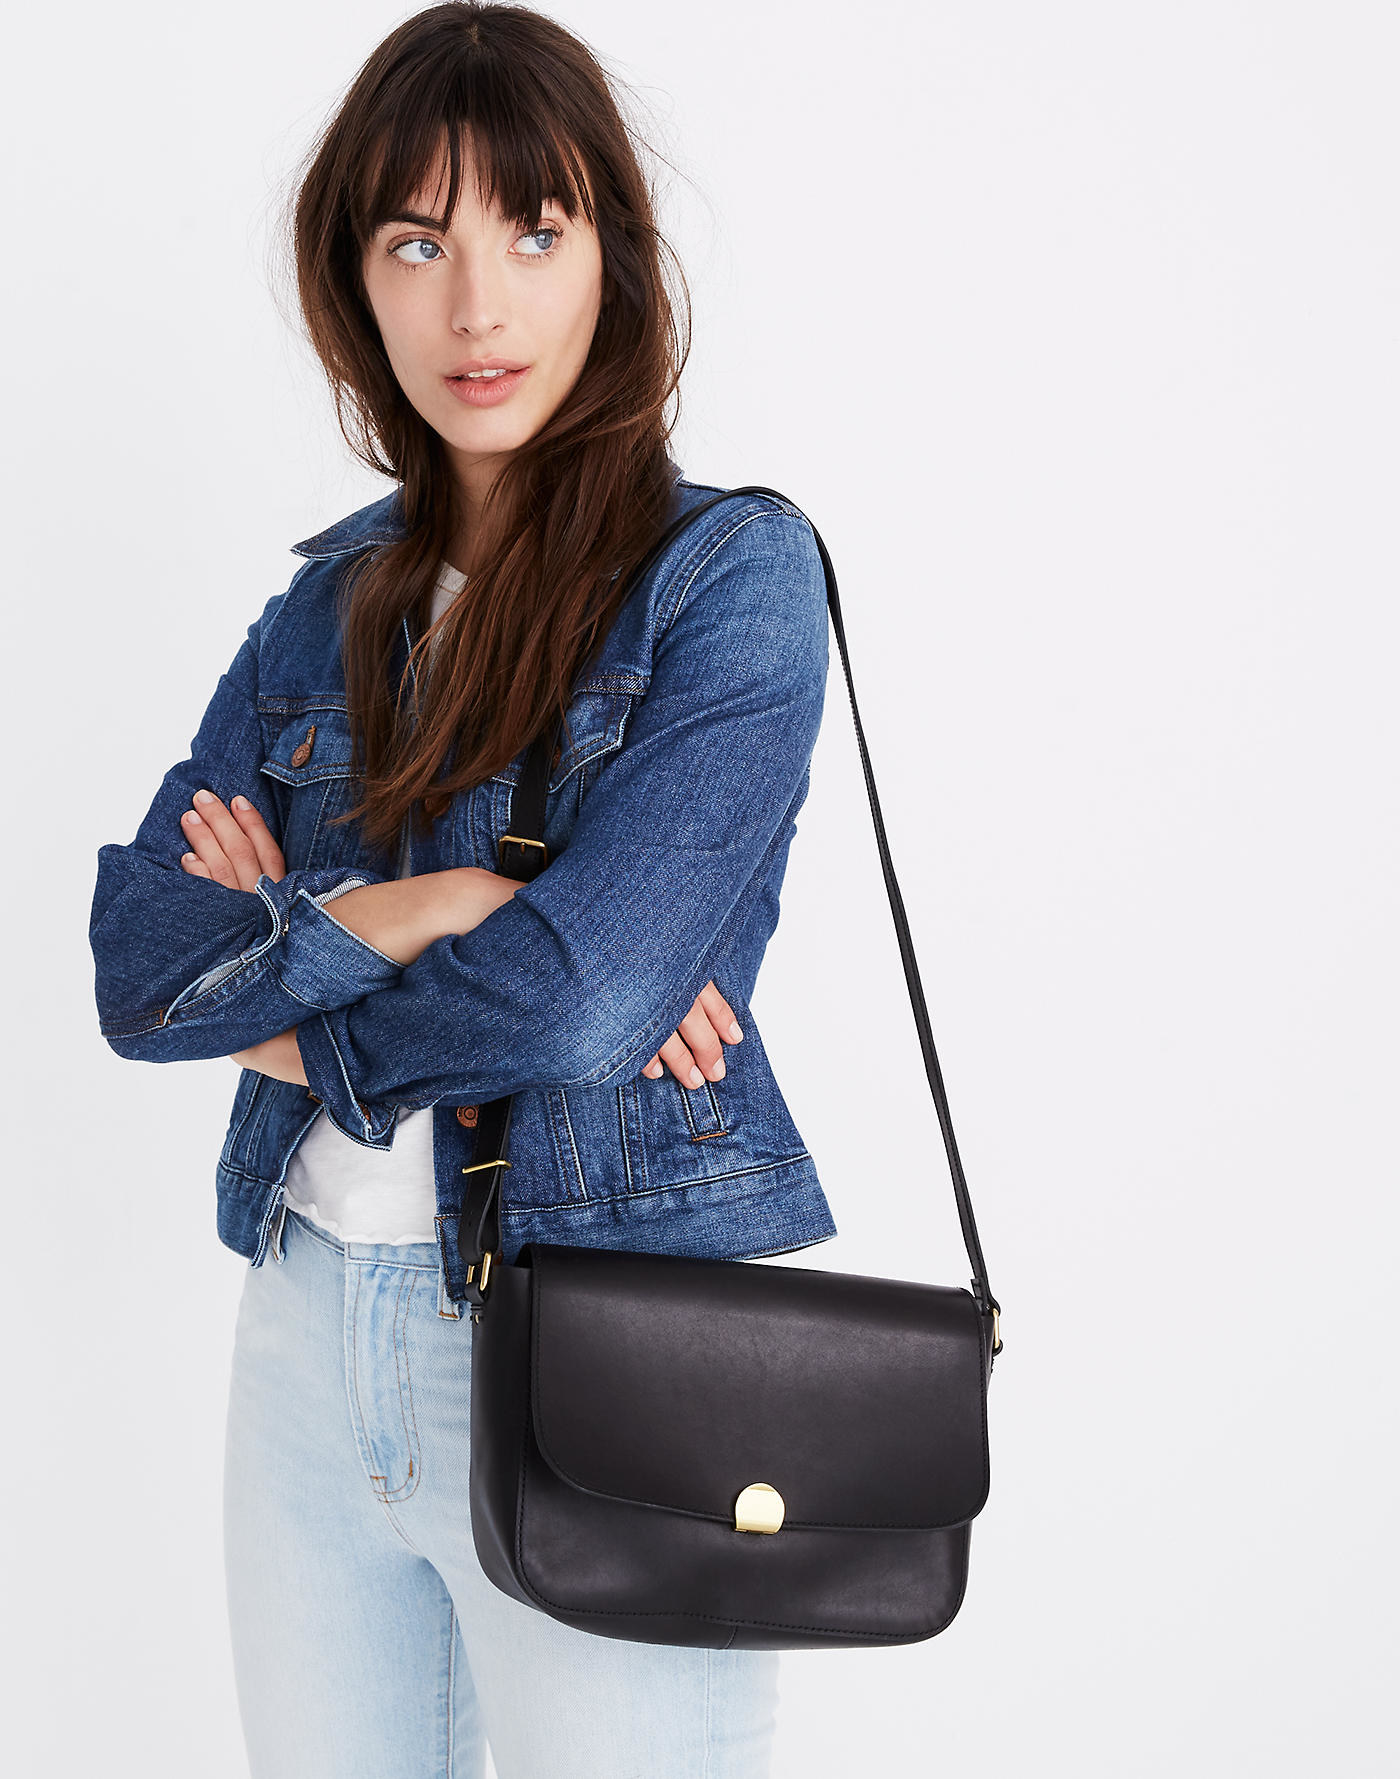 model carrying black crossbody purse